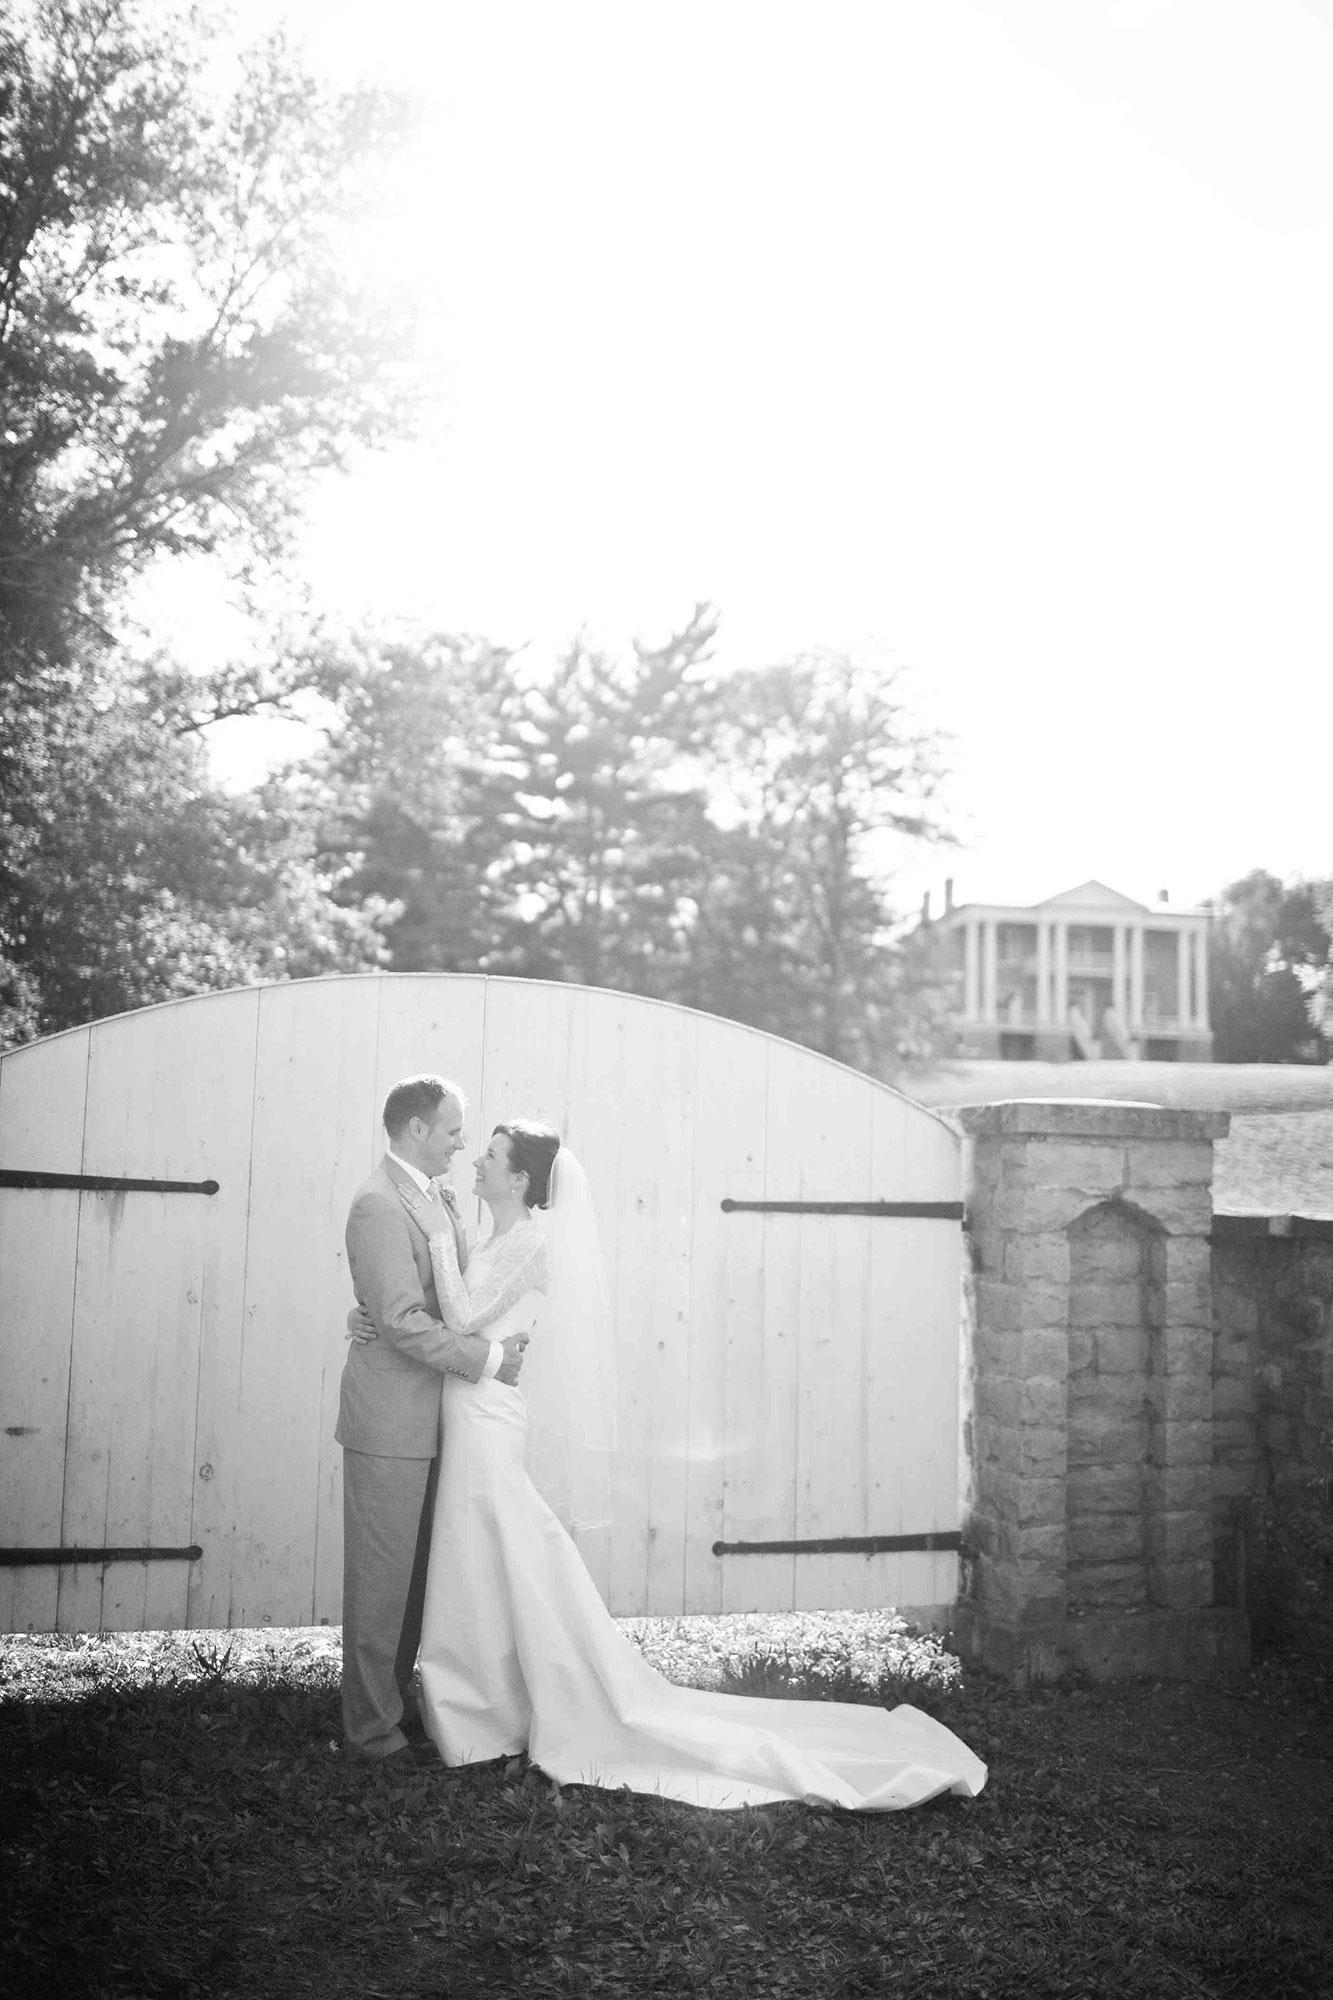 Amanda-Cowley-Willowbank-Vineyard-Bride-Photo-By-White-Photographie-029.jpg